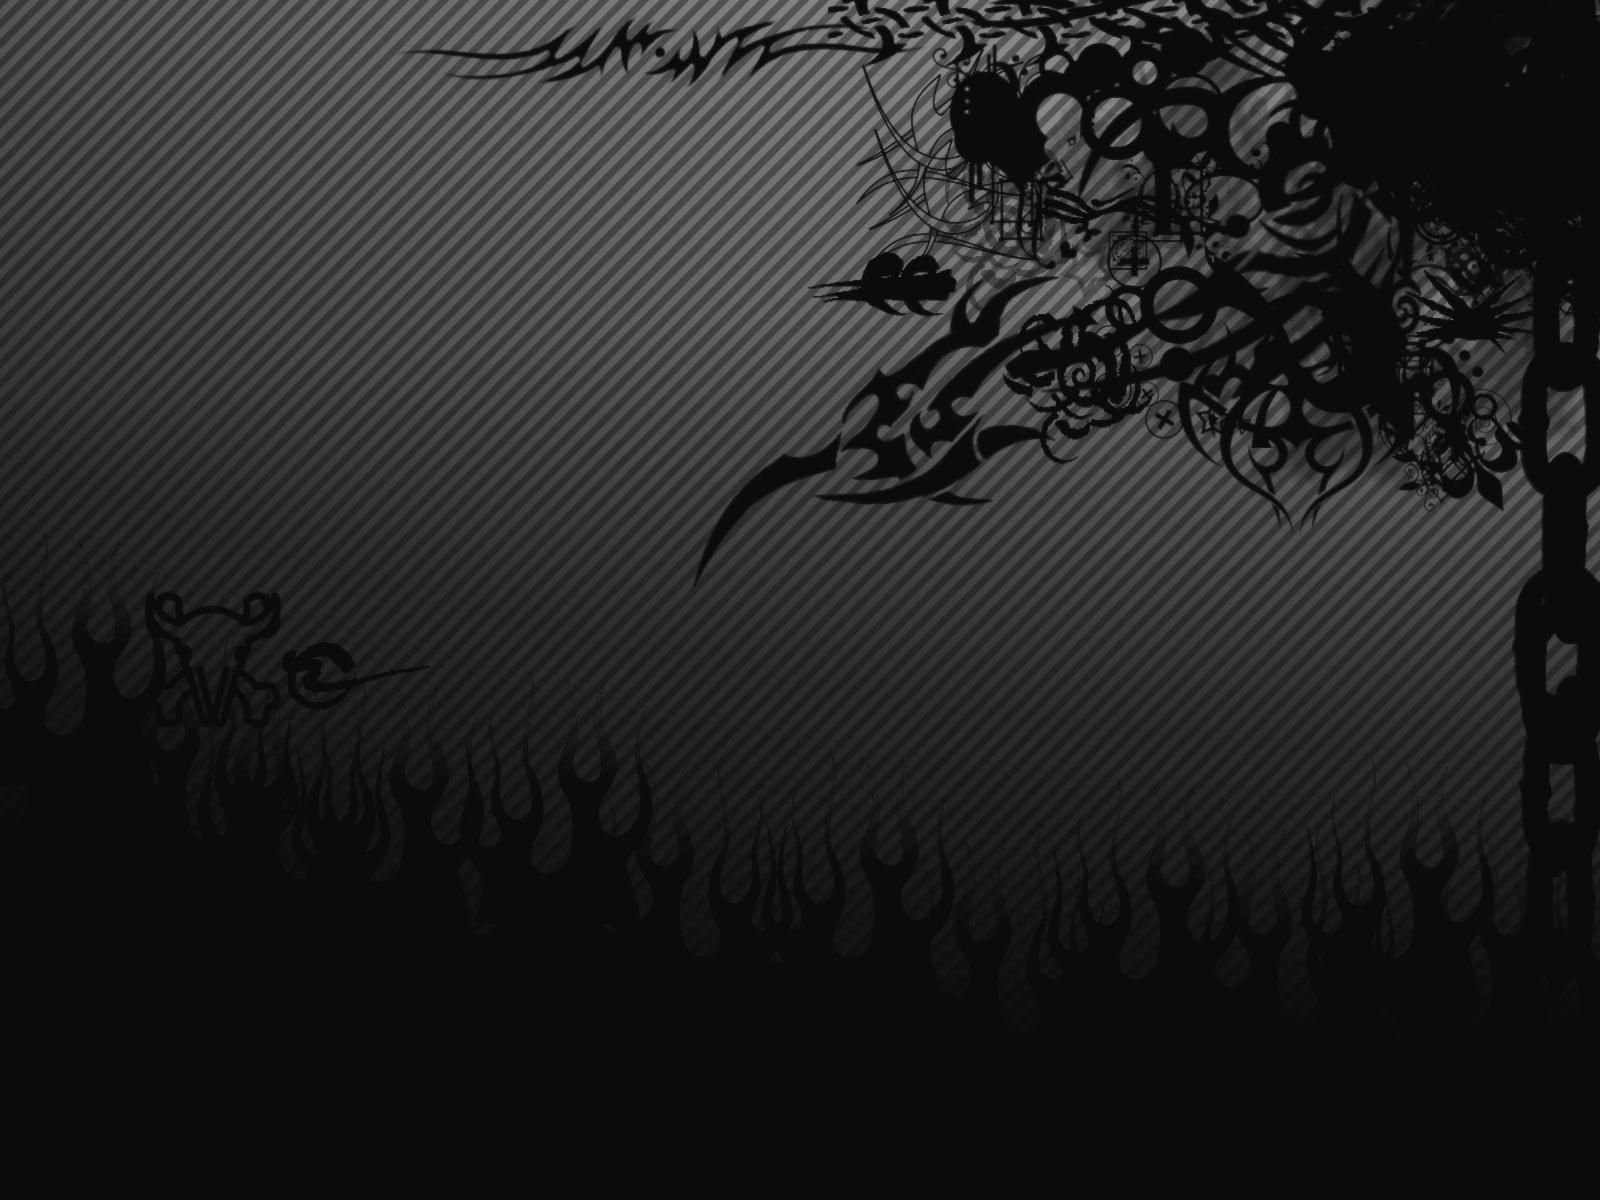 Black HD Wallpaper Backgrounds